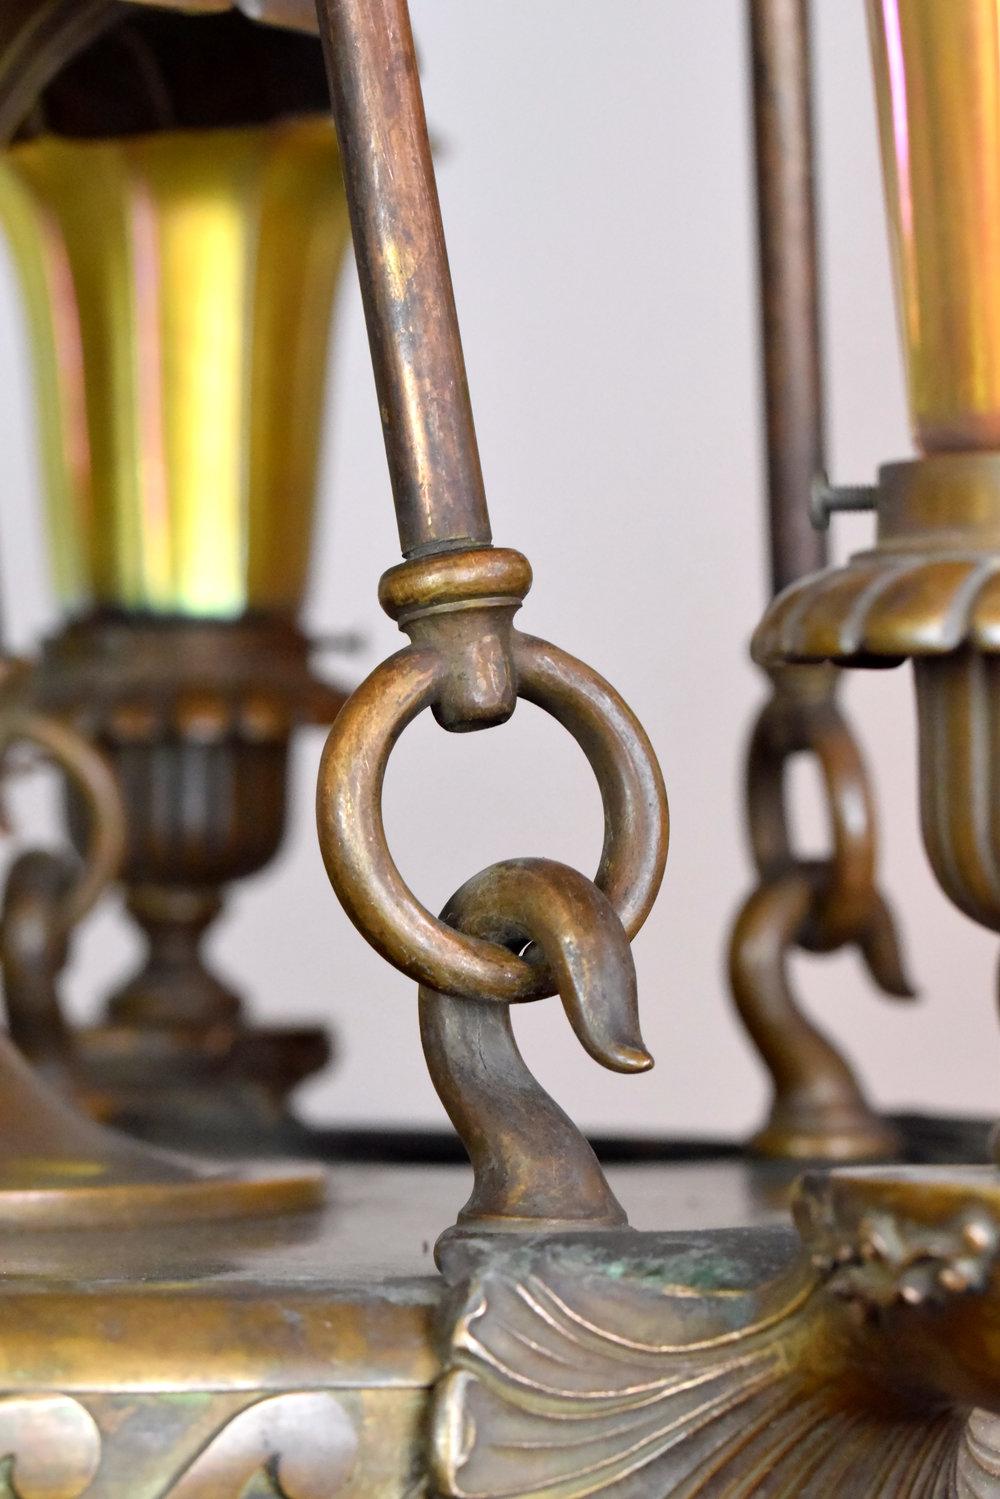 47590-cast-bronze-nine-light-chandelier-close-up.jpg